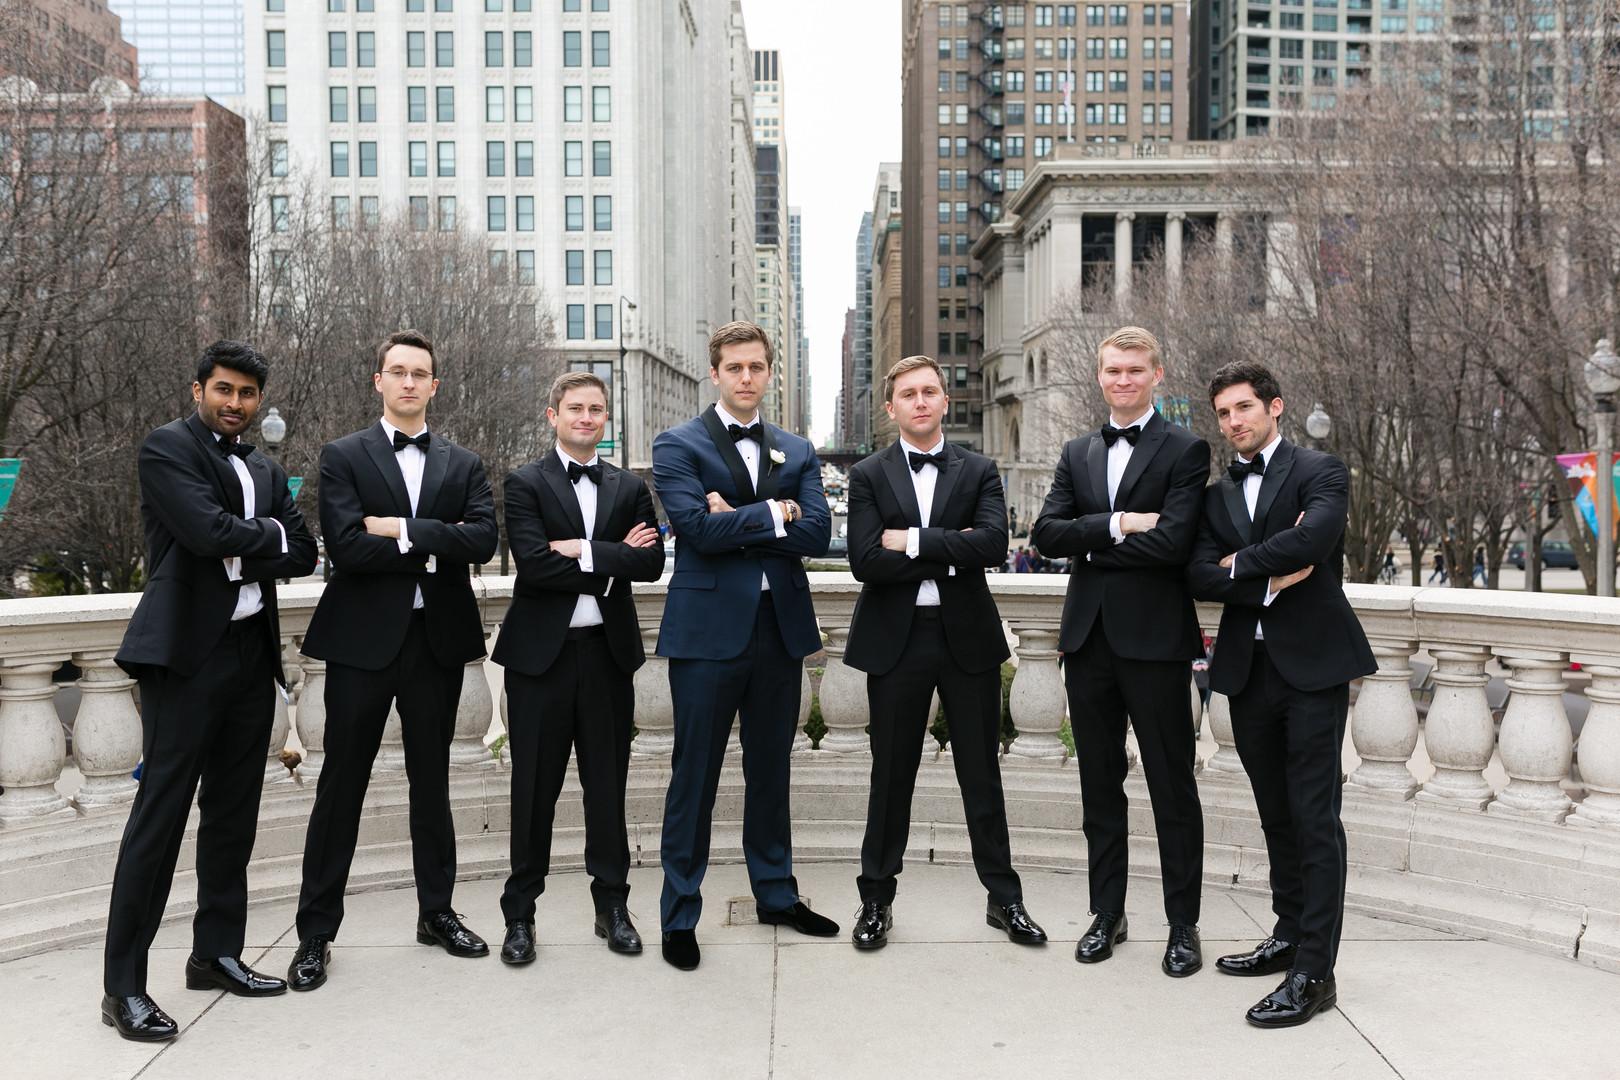 Black and Navy Groomsmen Suits Chicago Wedding Emilia Jane Photography